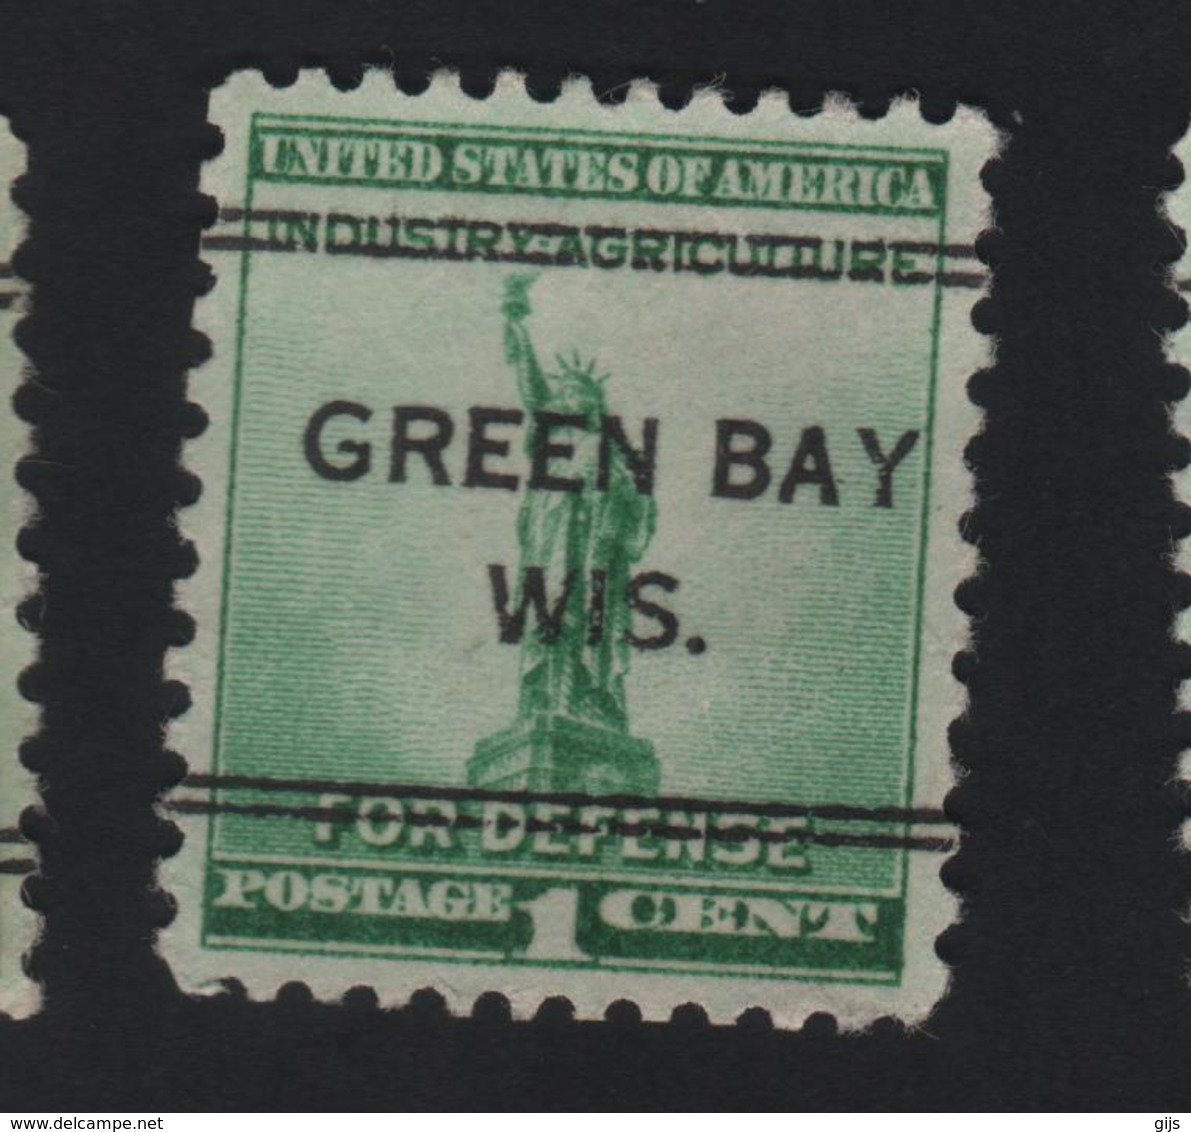 USA 757 SCOTT 899 GREEN BAY WIS - Prematasellado